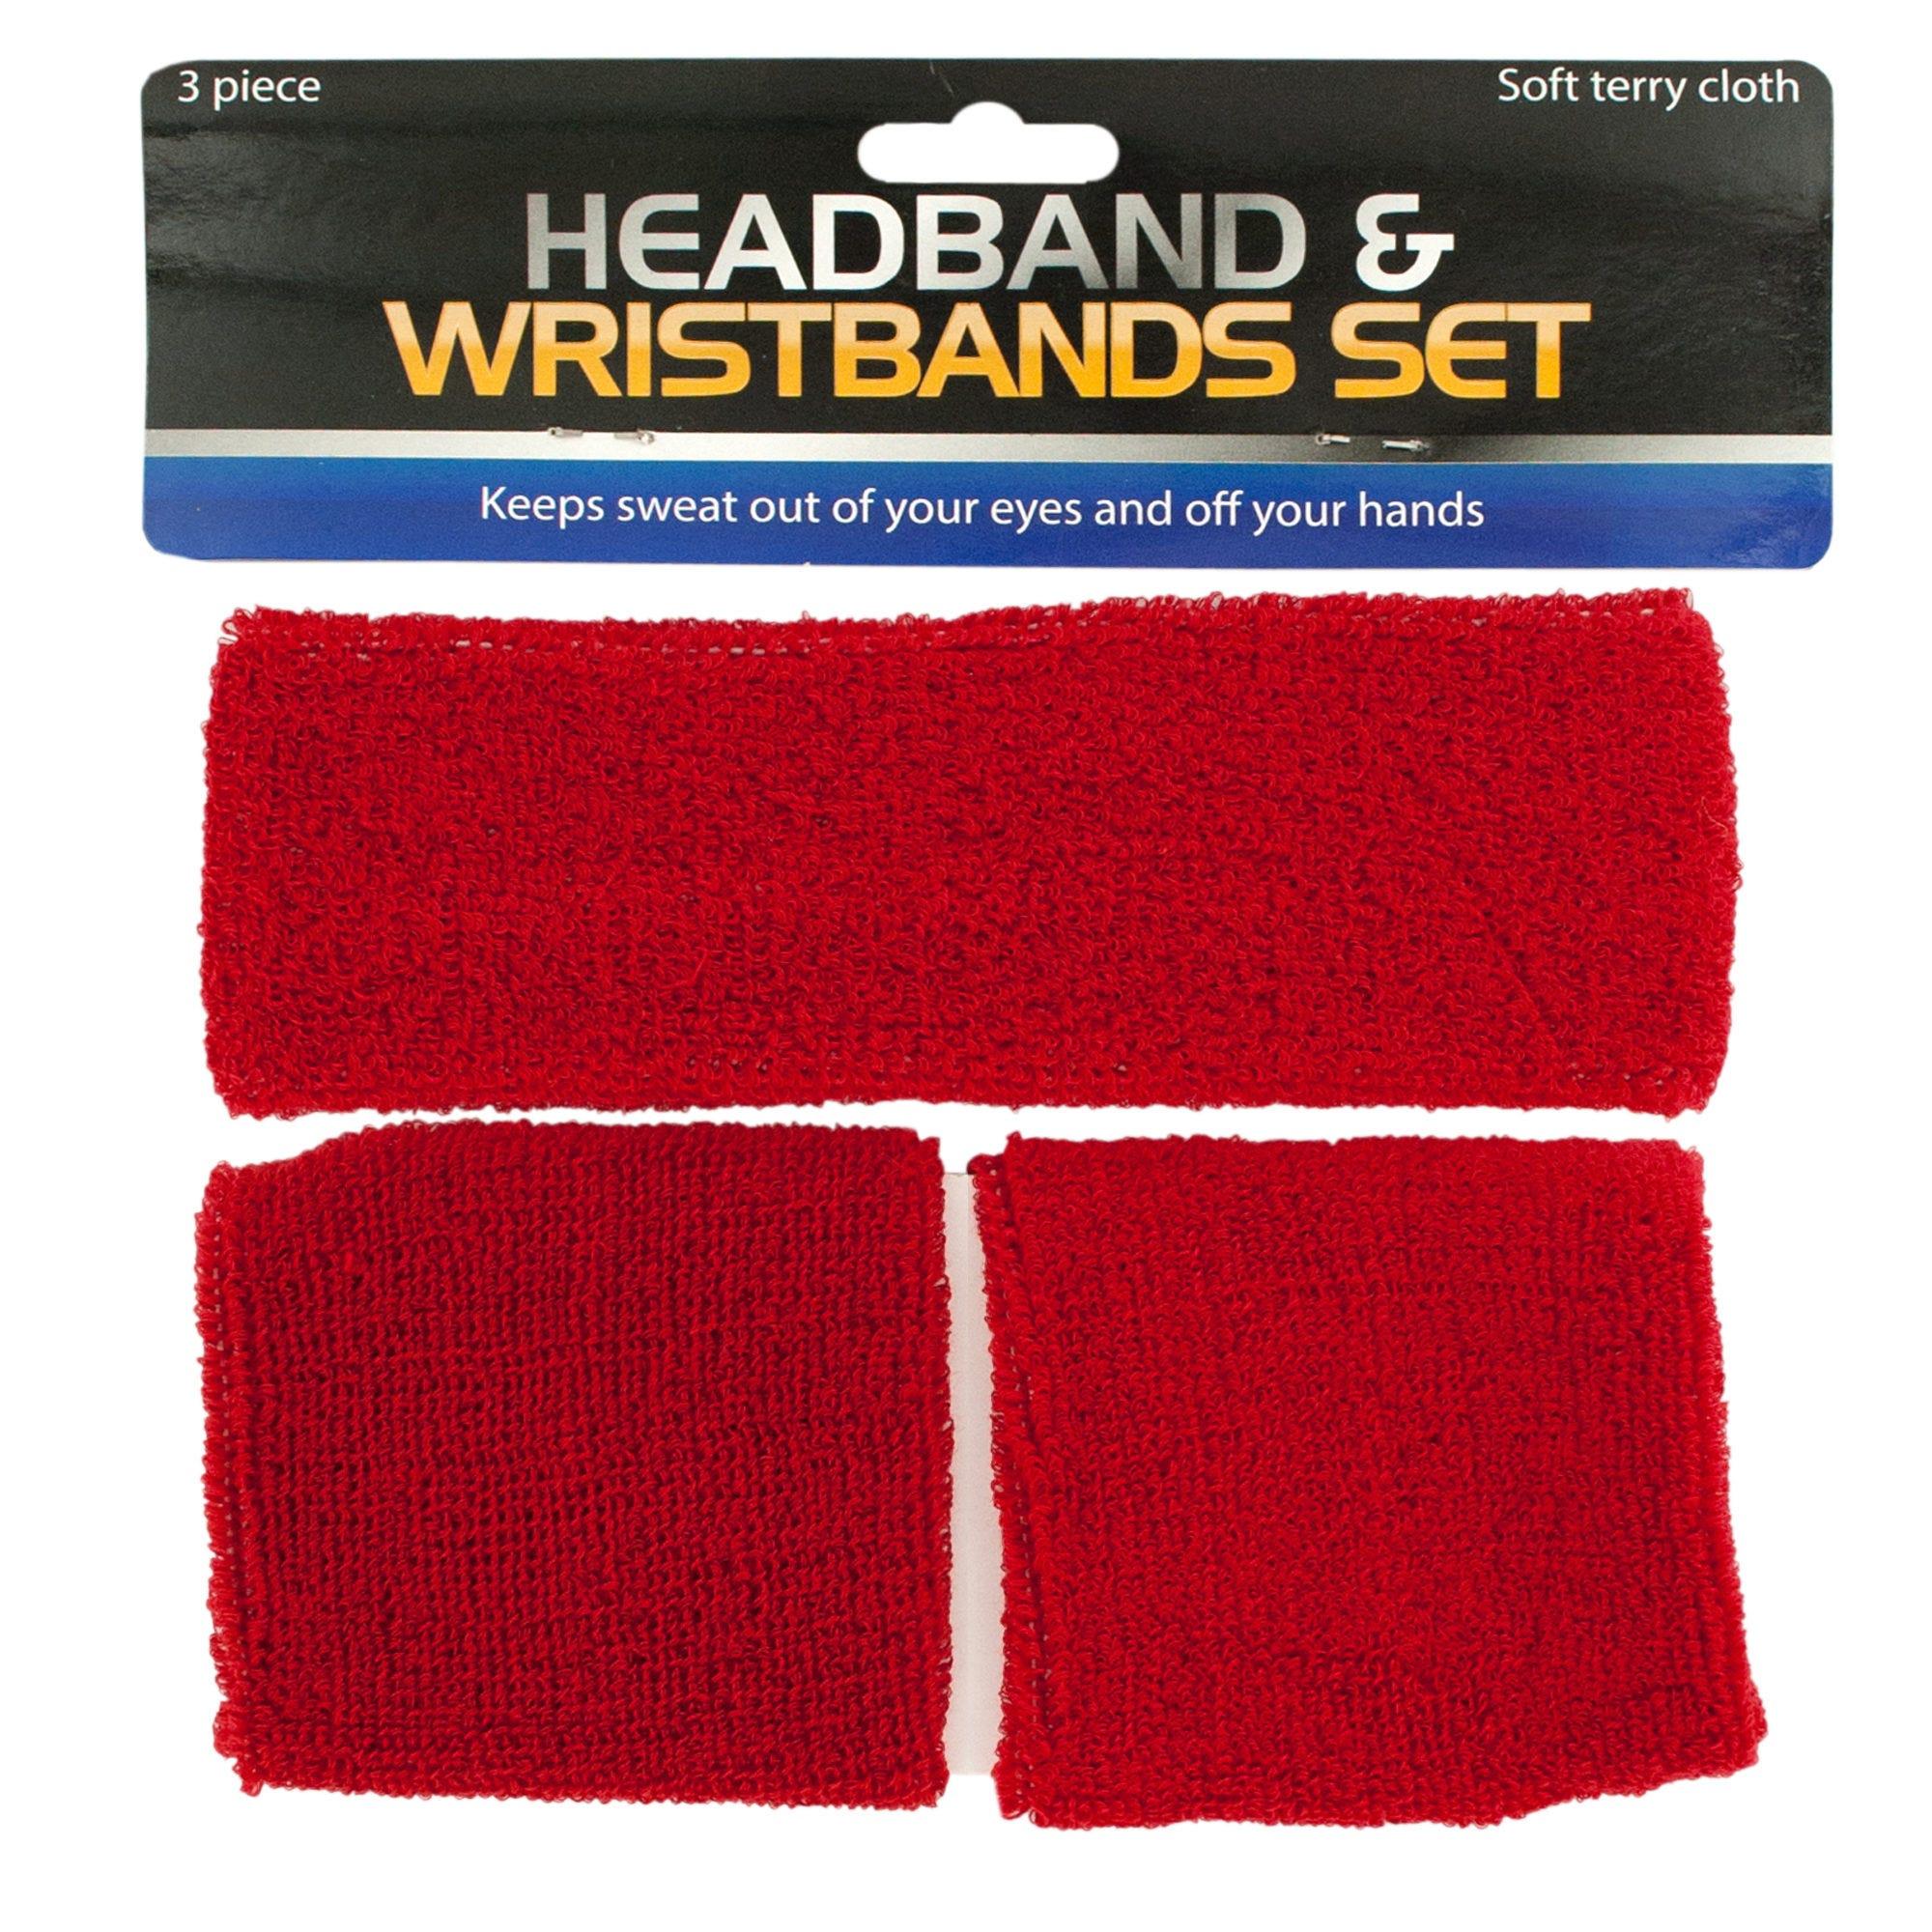 athletic-headBAND-WRISTBANDs-set